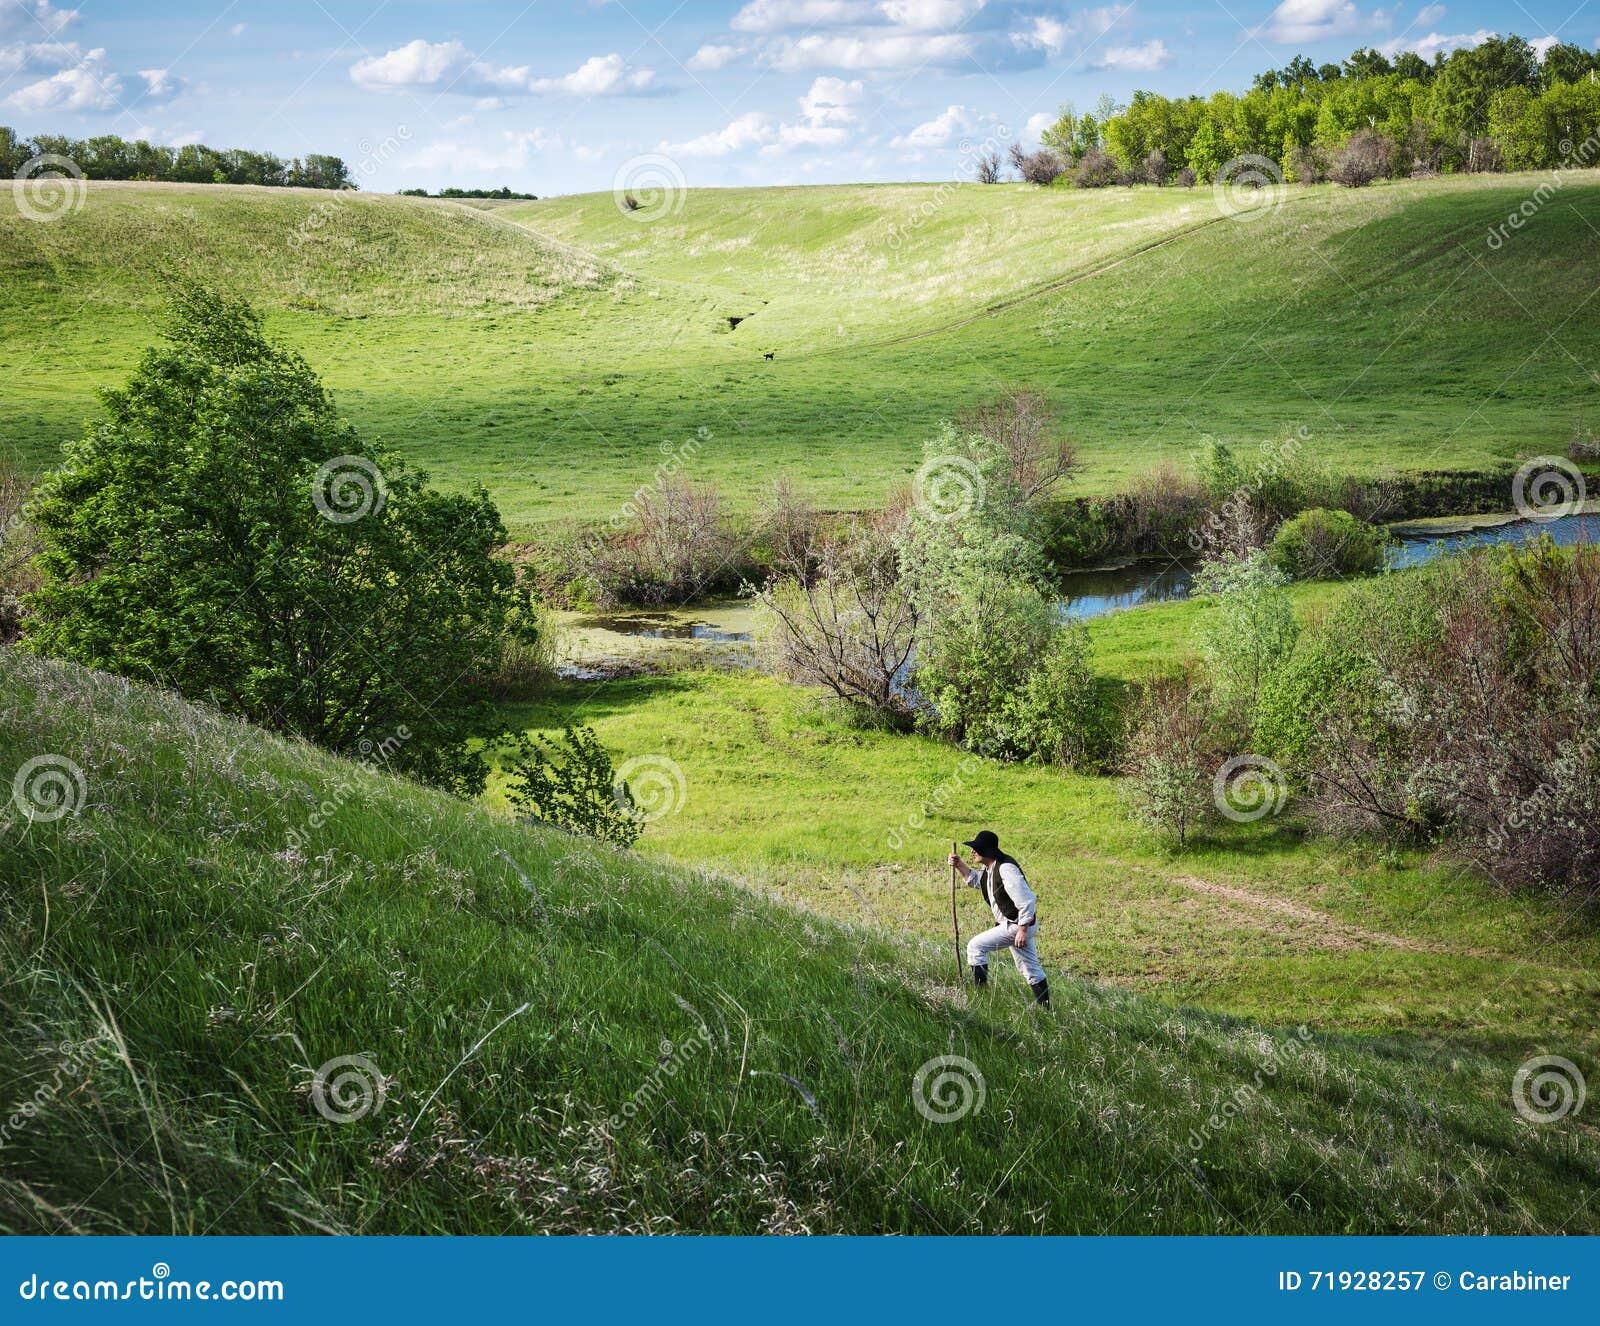 Человек в черной шляпе с stic подъемы наклон на холм